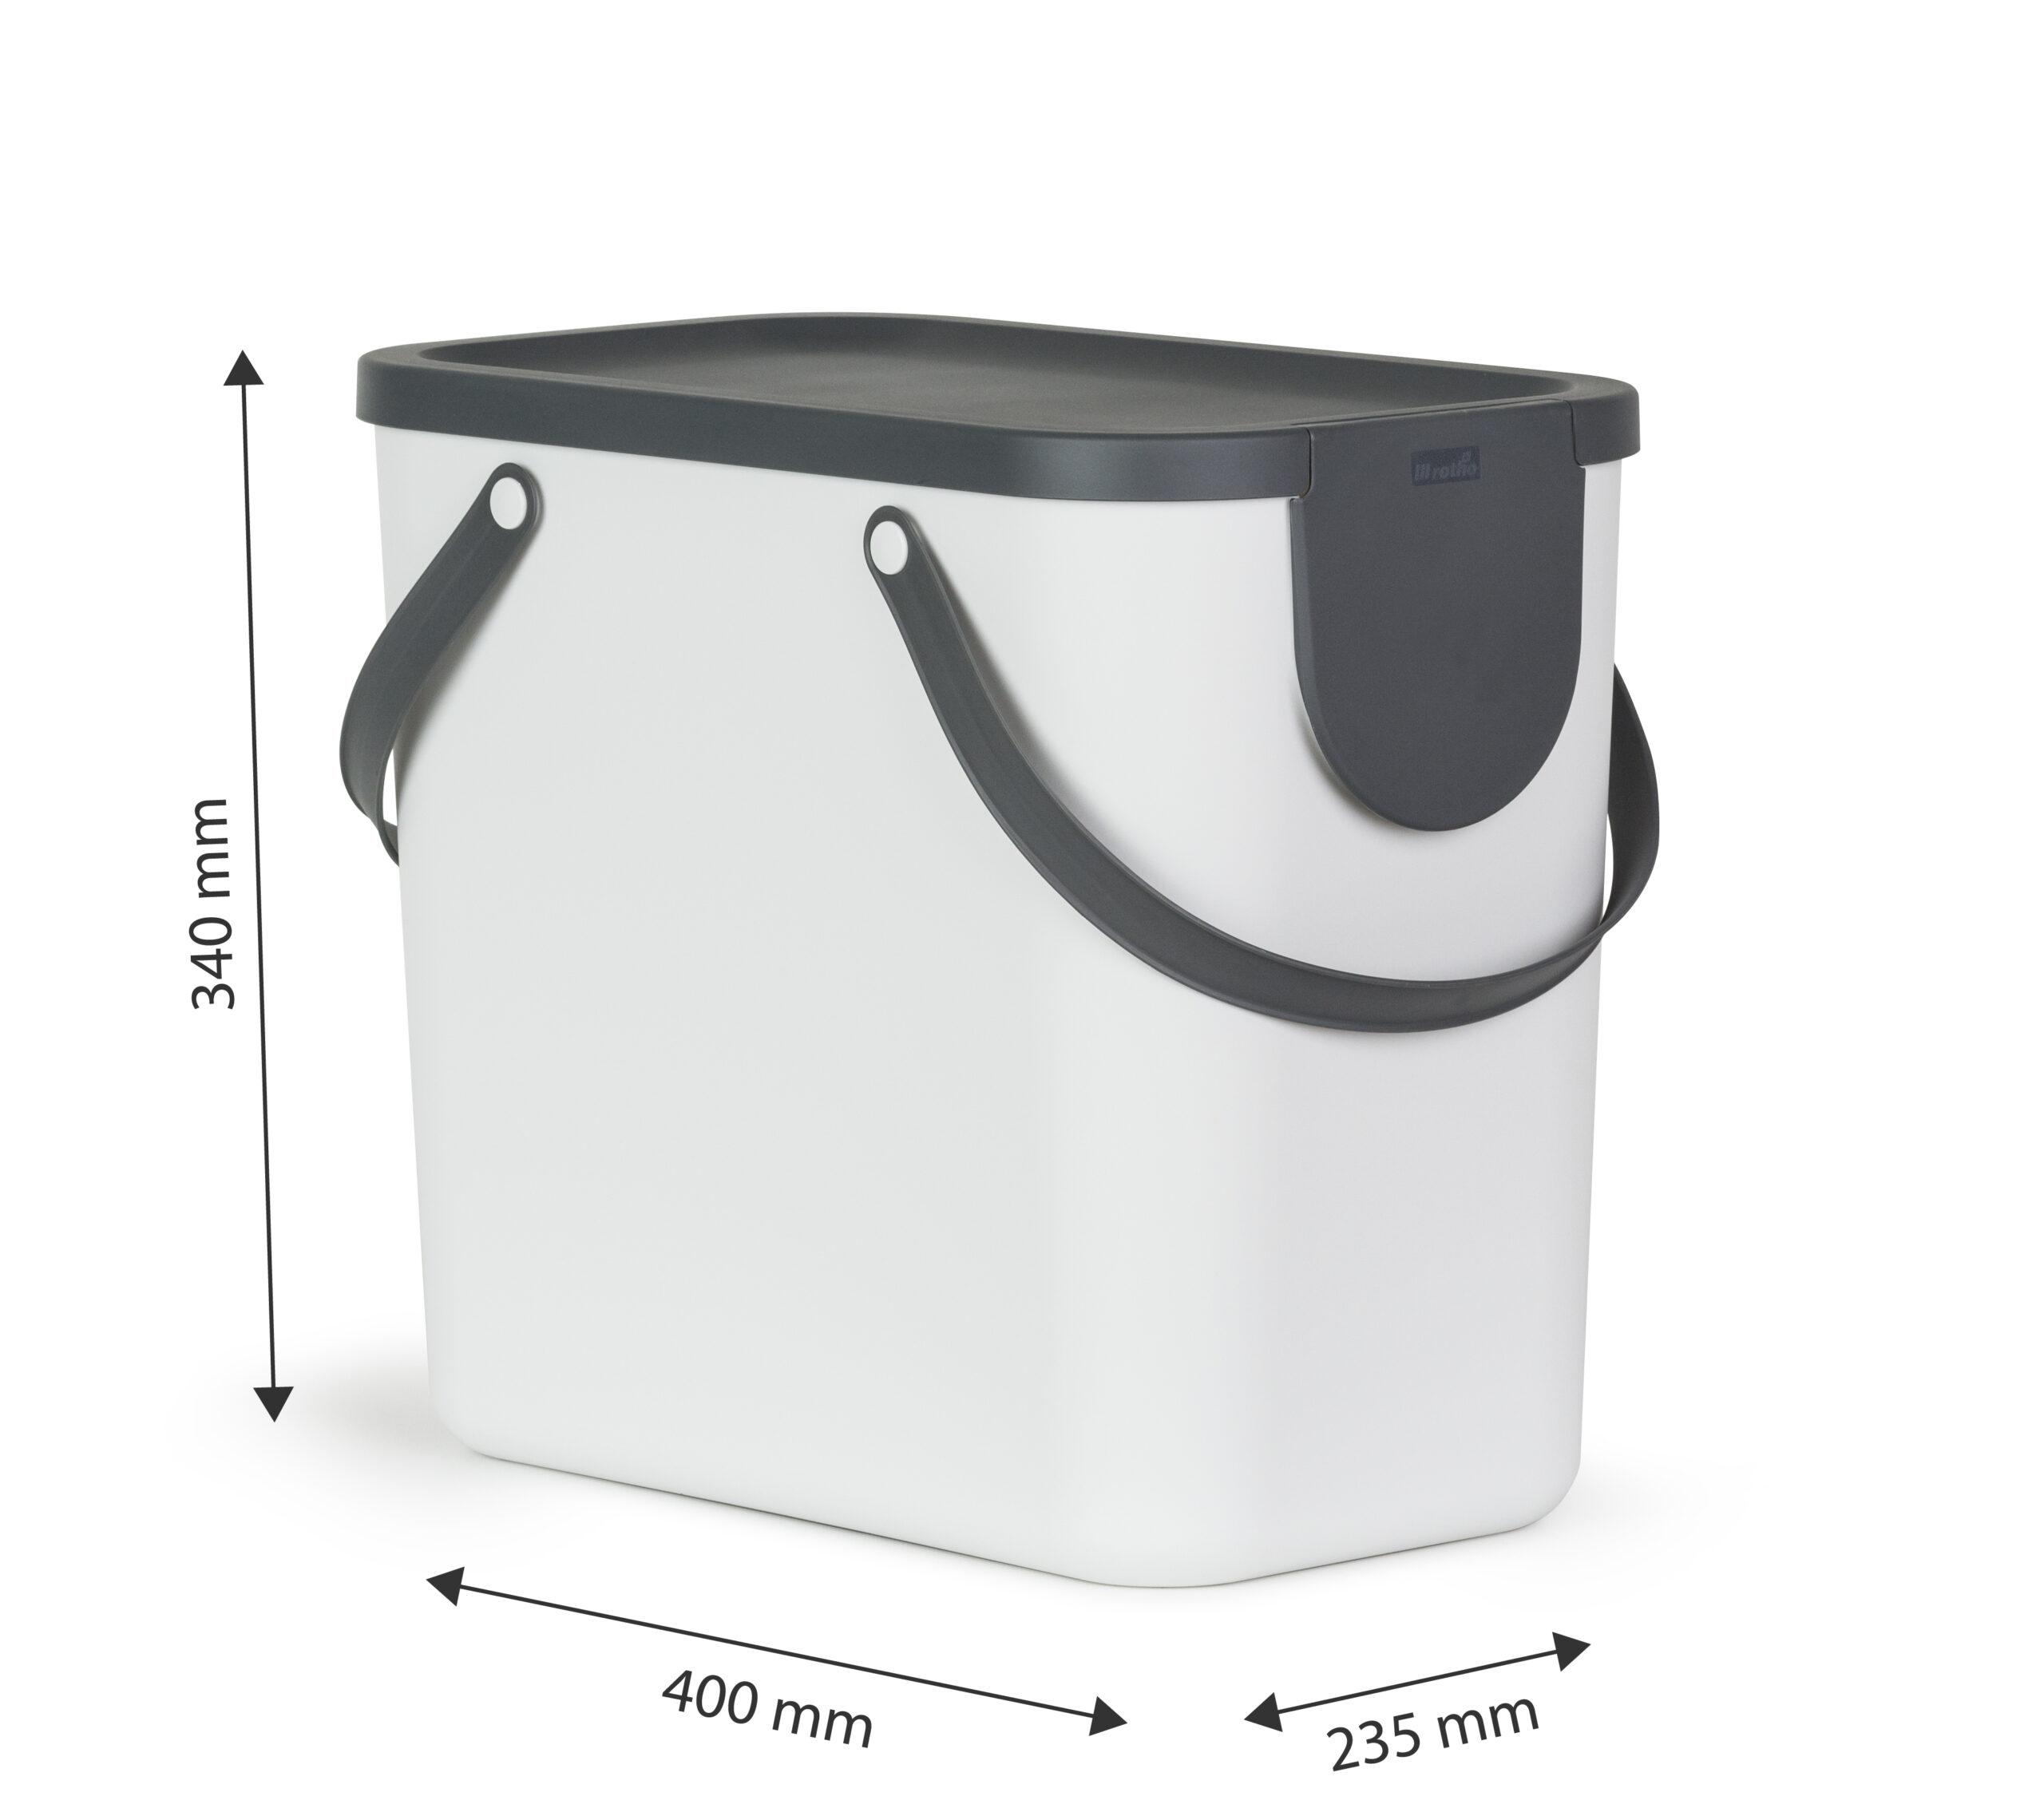 Full Size of Müllsystem Recycling Mllsystem Albula 25 L Jetzt Versandkostenfrei Kaufen Küche Wohnzimmer Müllsystem